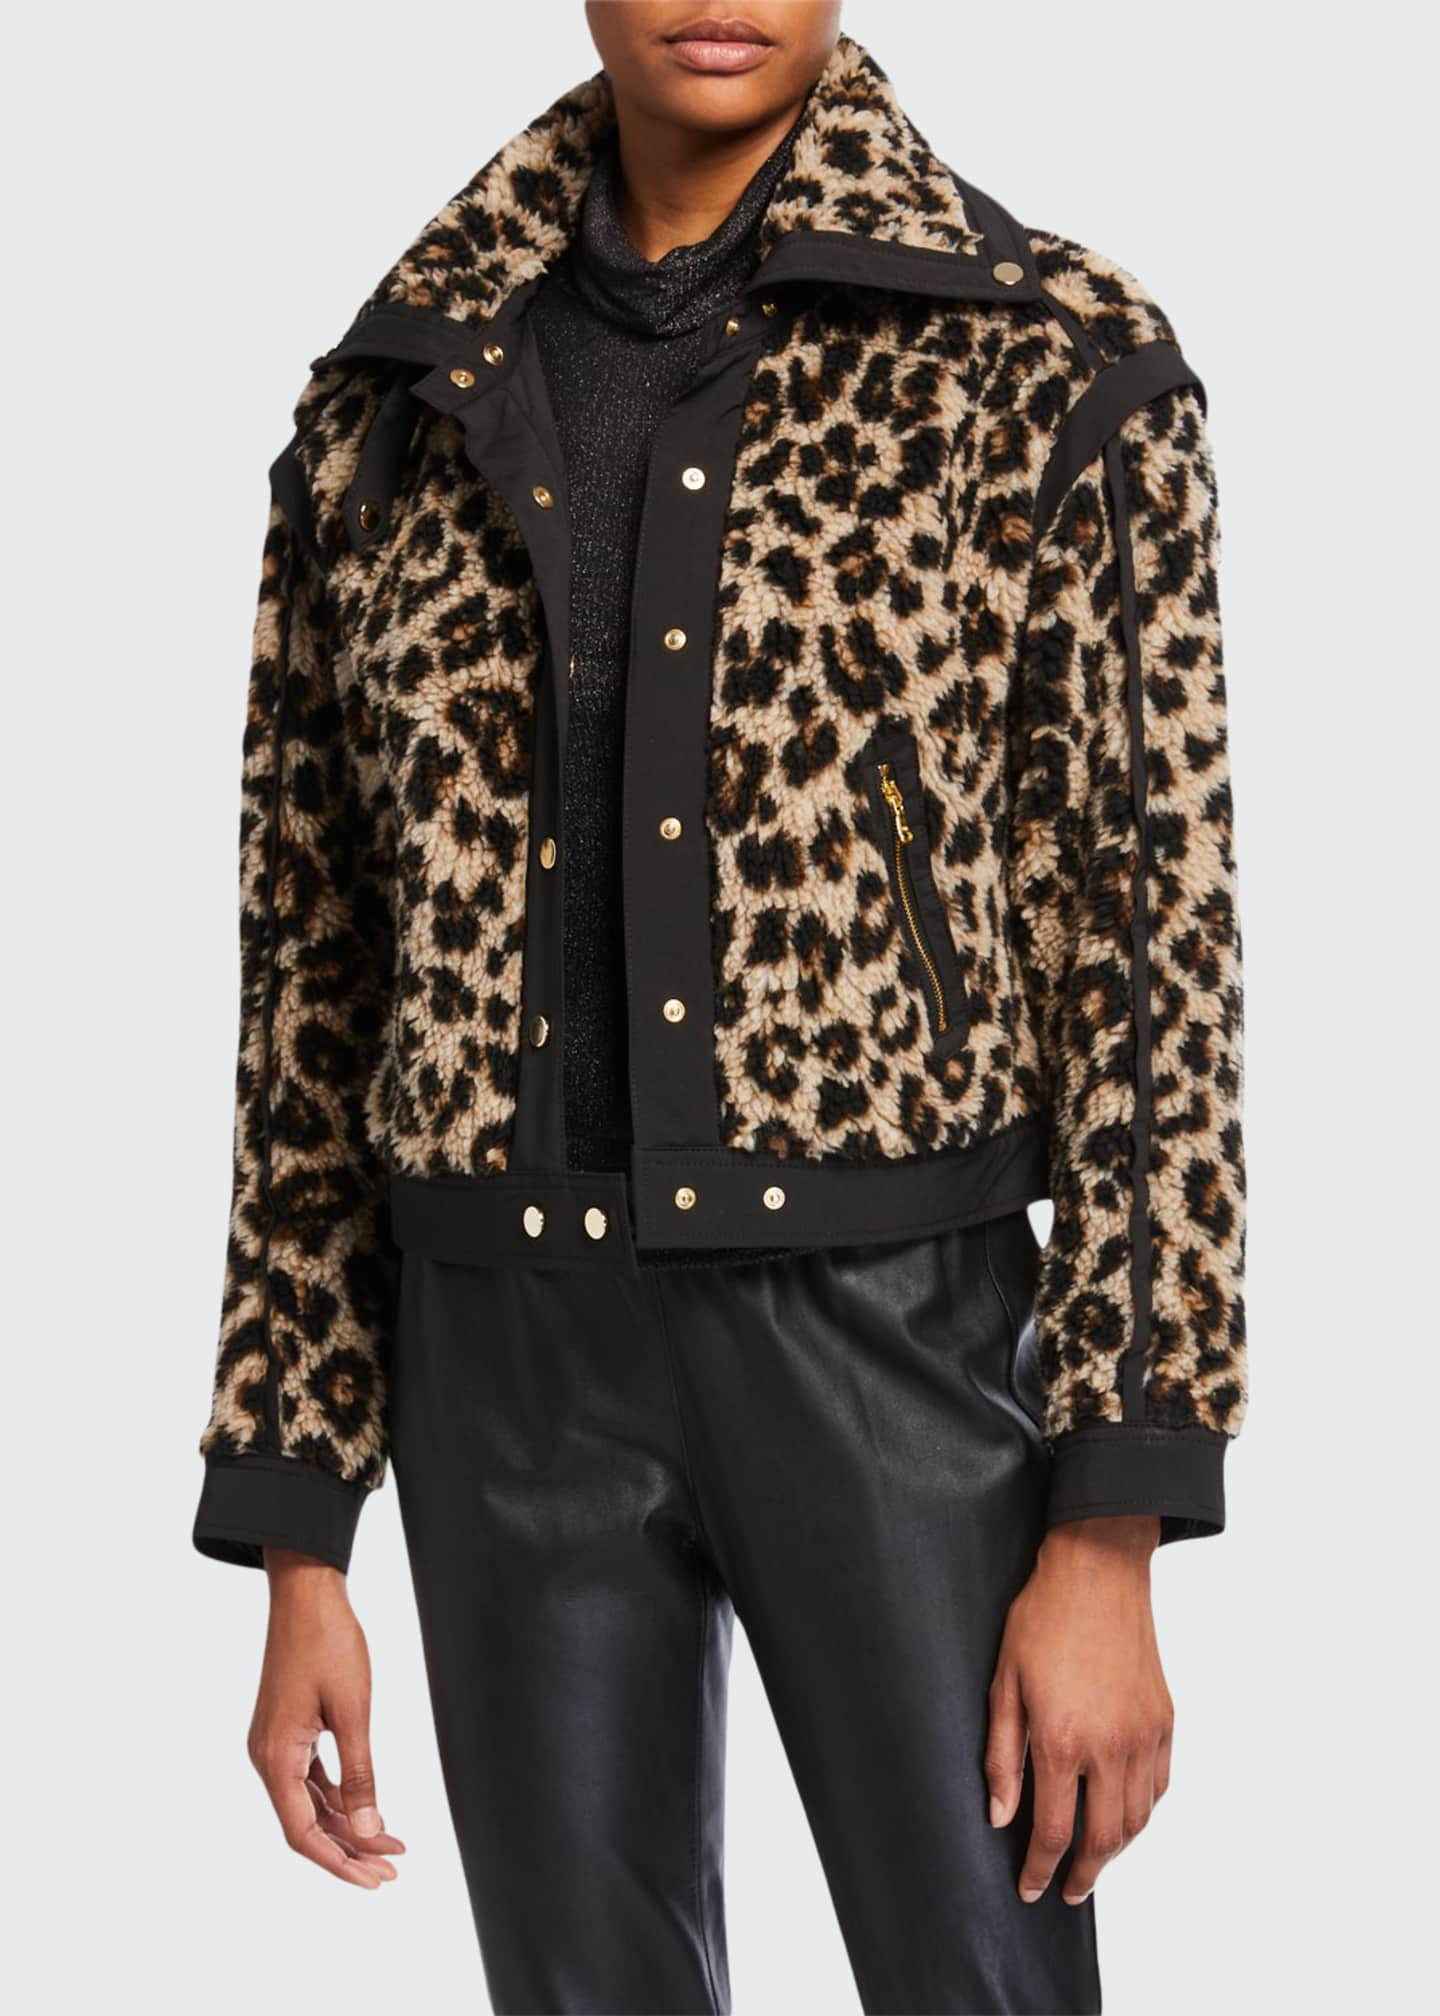 Veronica Beard Anita Faux-Fur Snap-Front Jacket